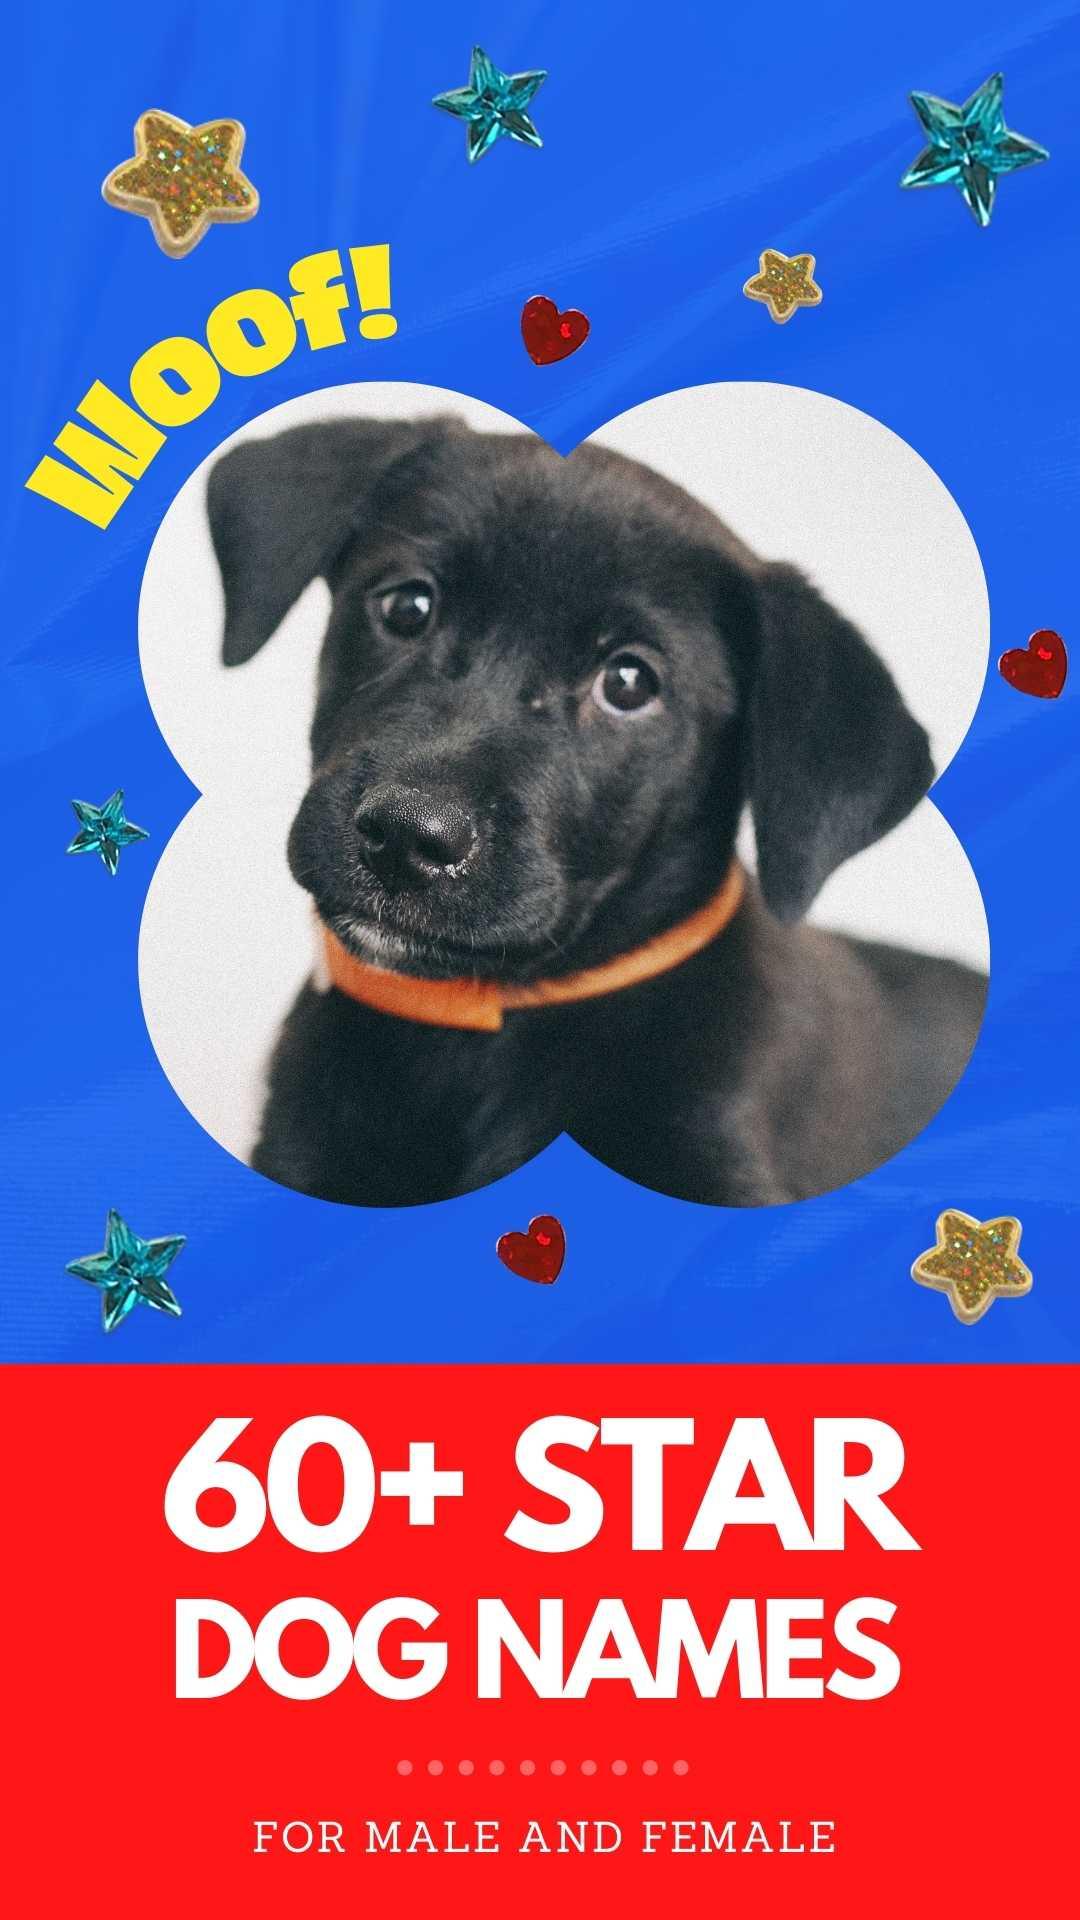 star dog names for naming a dog